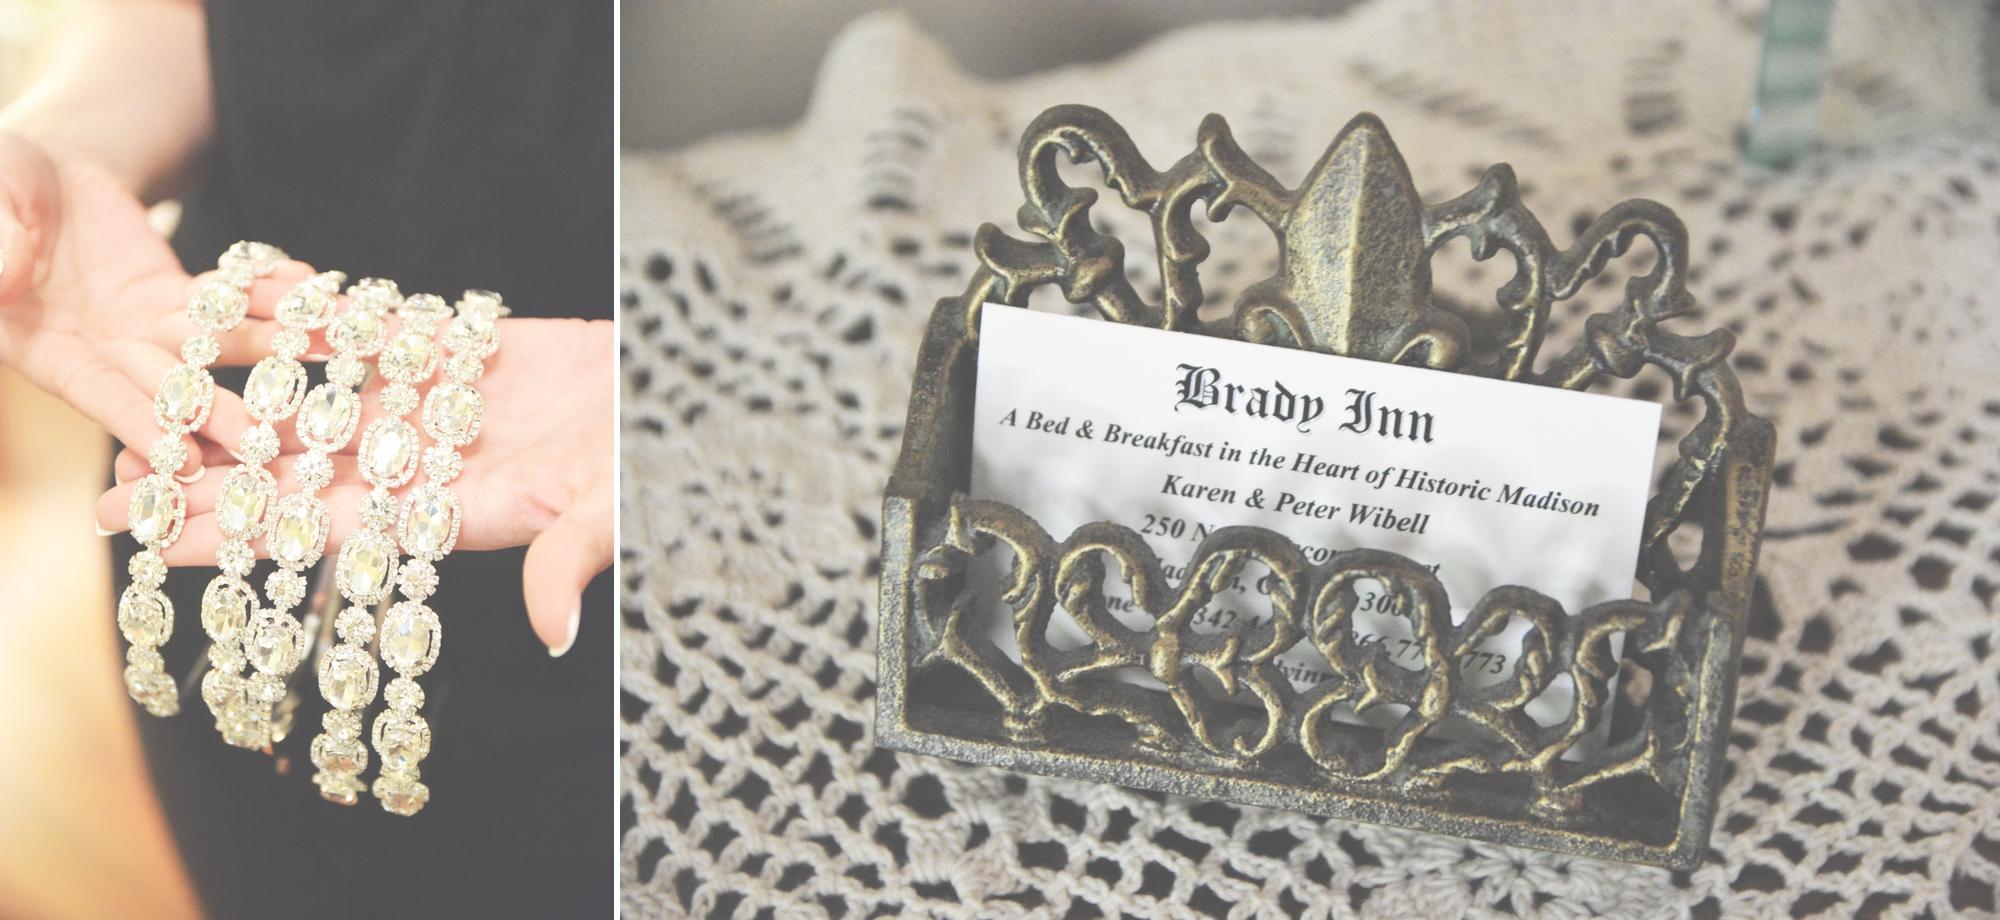 Wedding at the Brady Inn - RobotBooth + Six Heart Photography 6